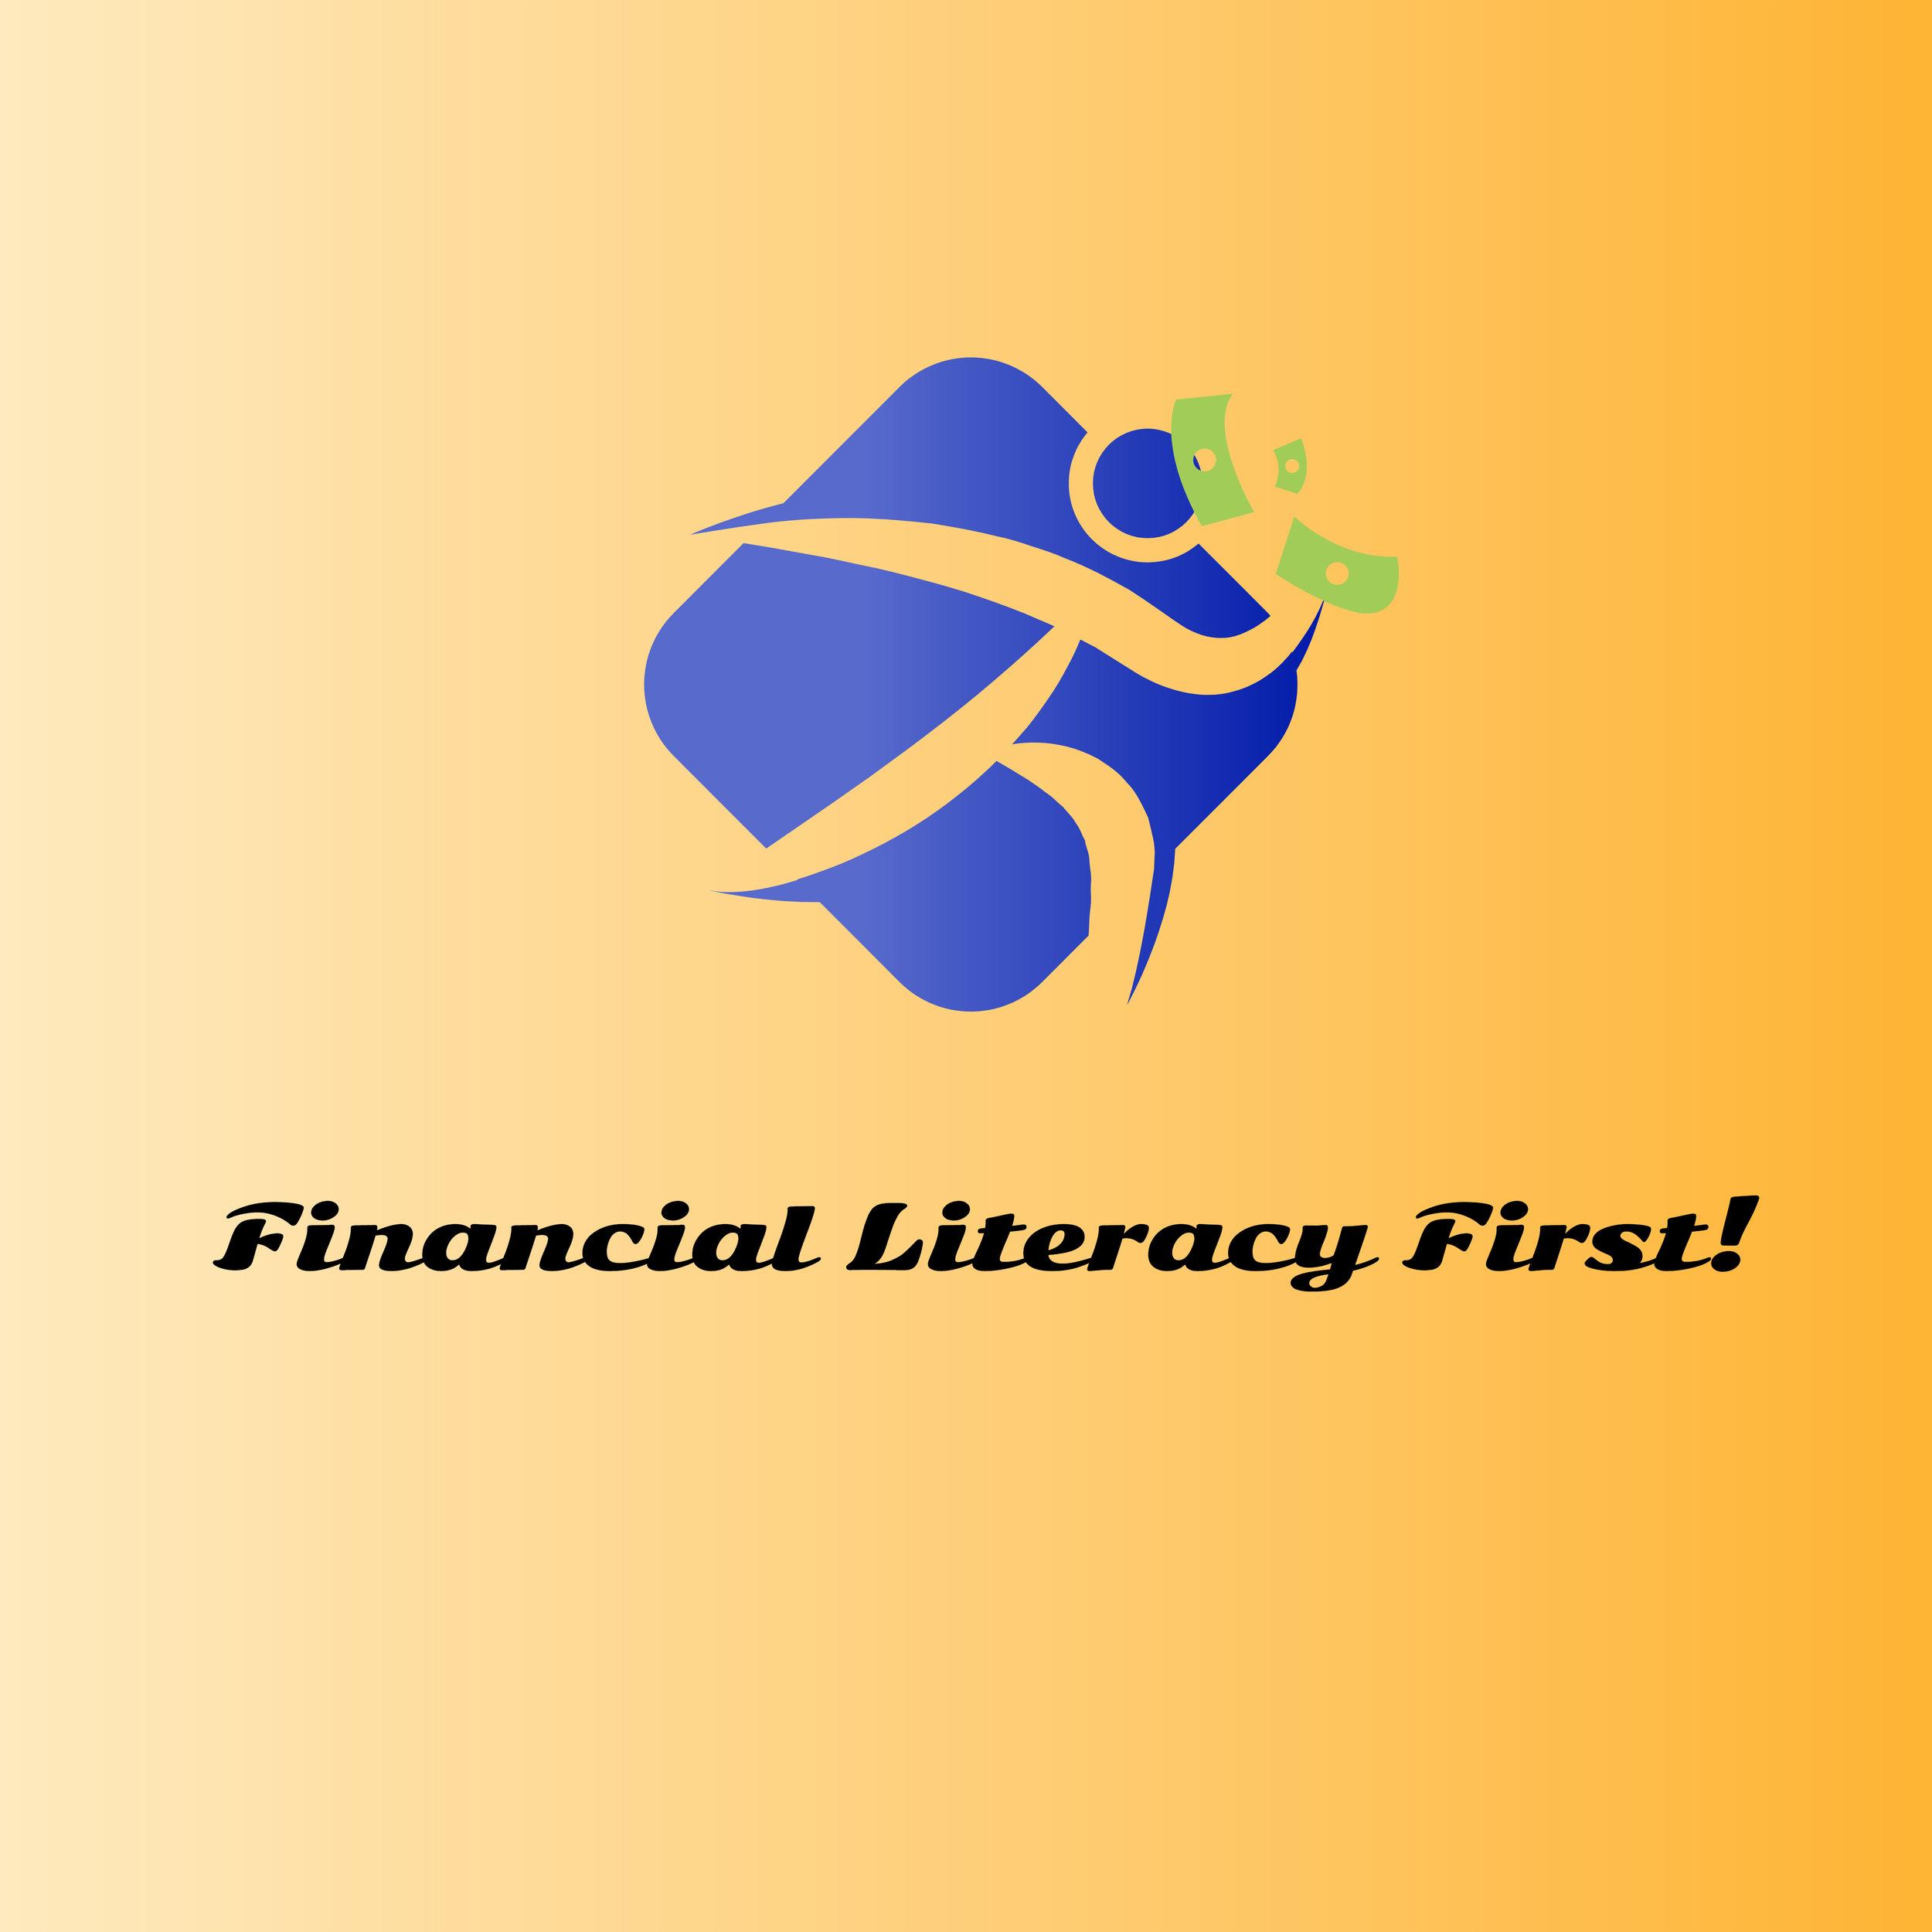 Fin Lit New Logo.jpg